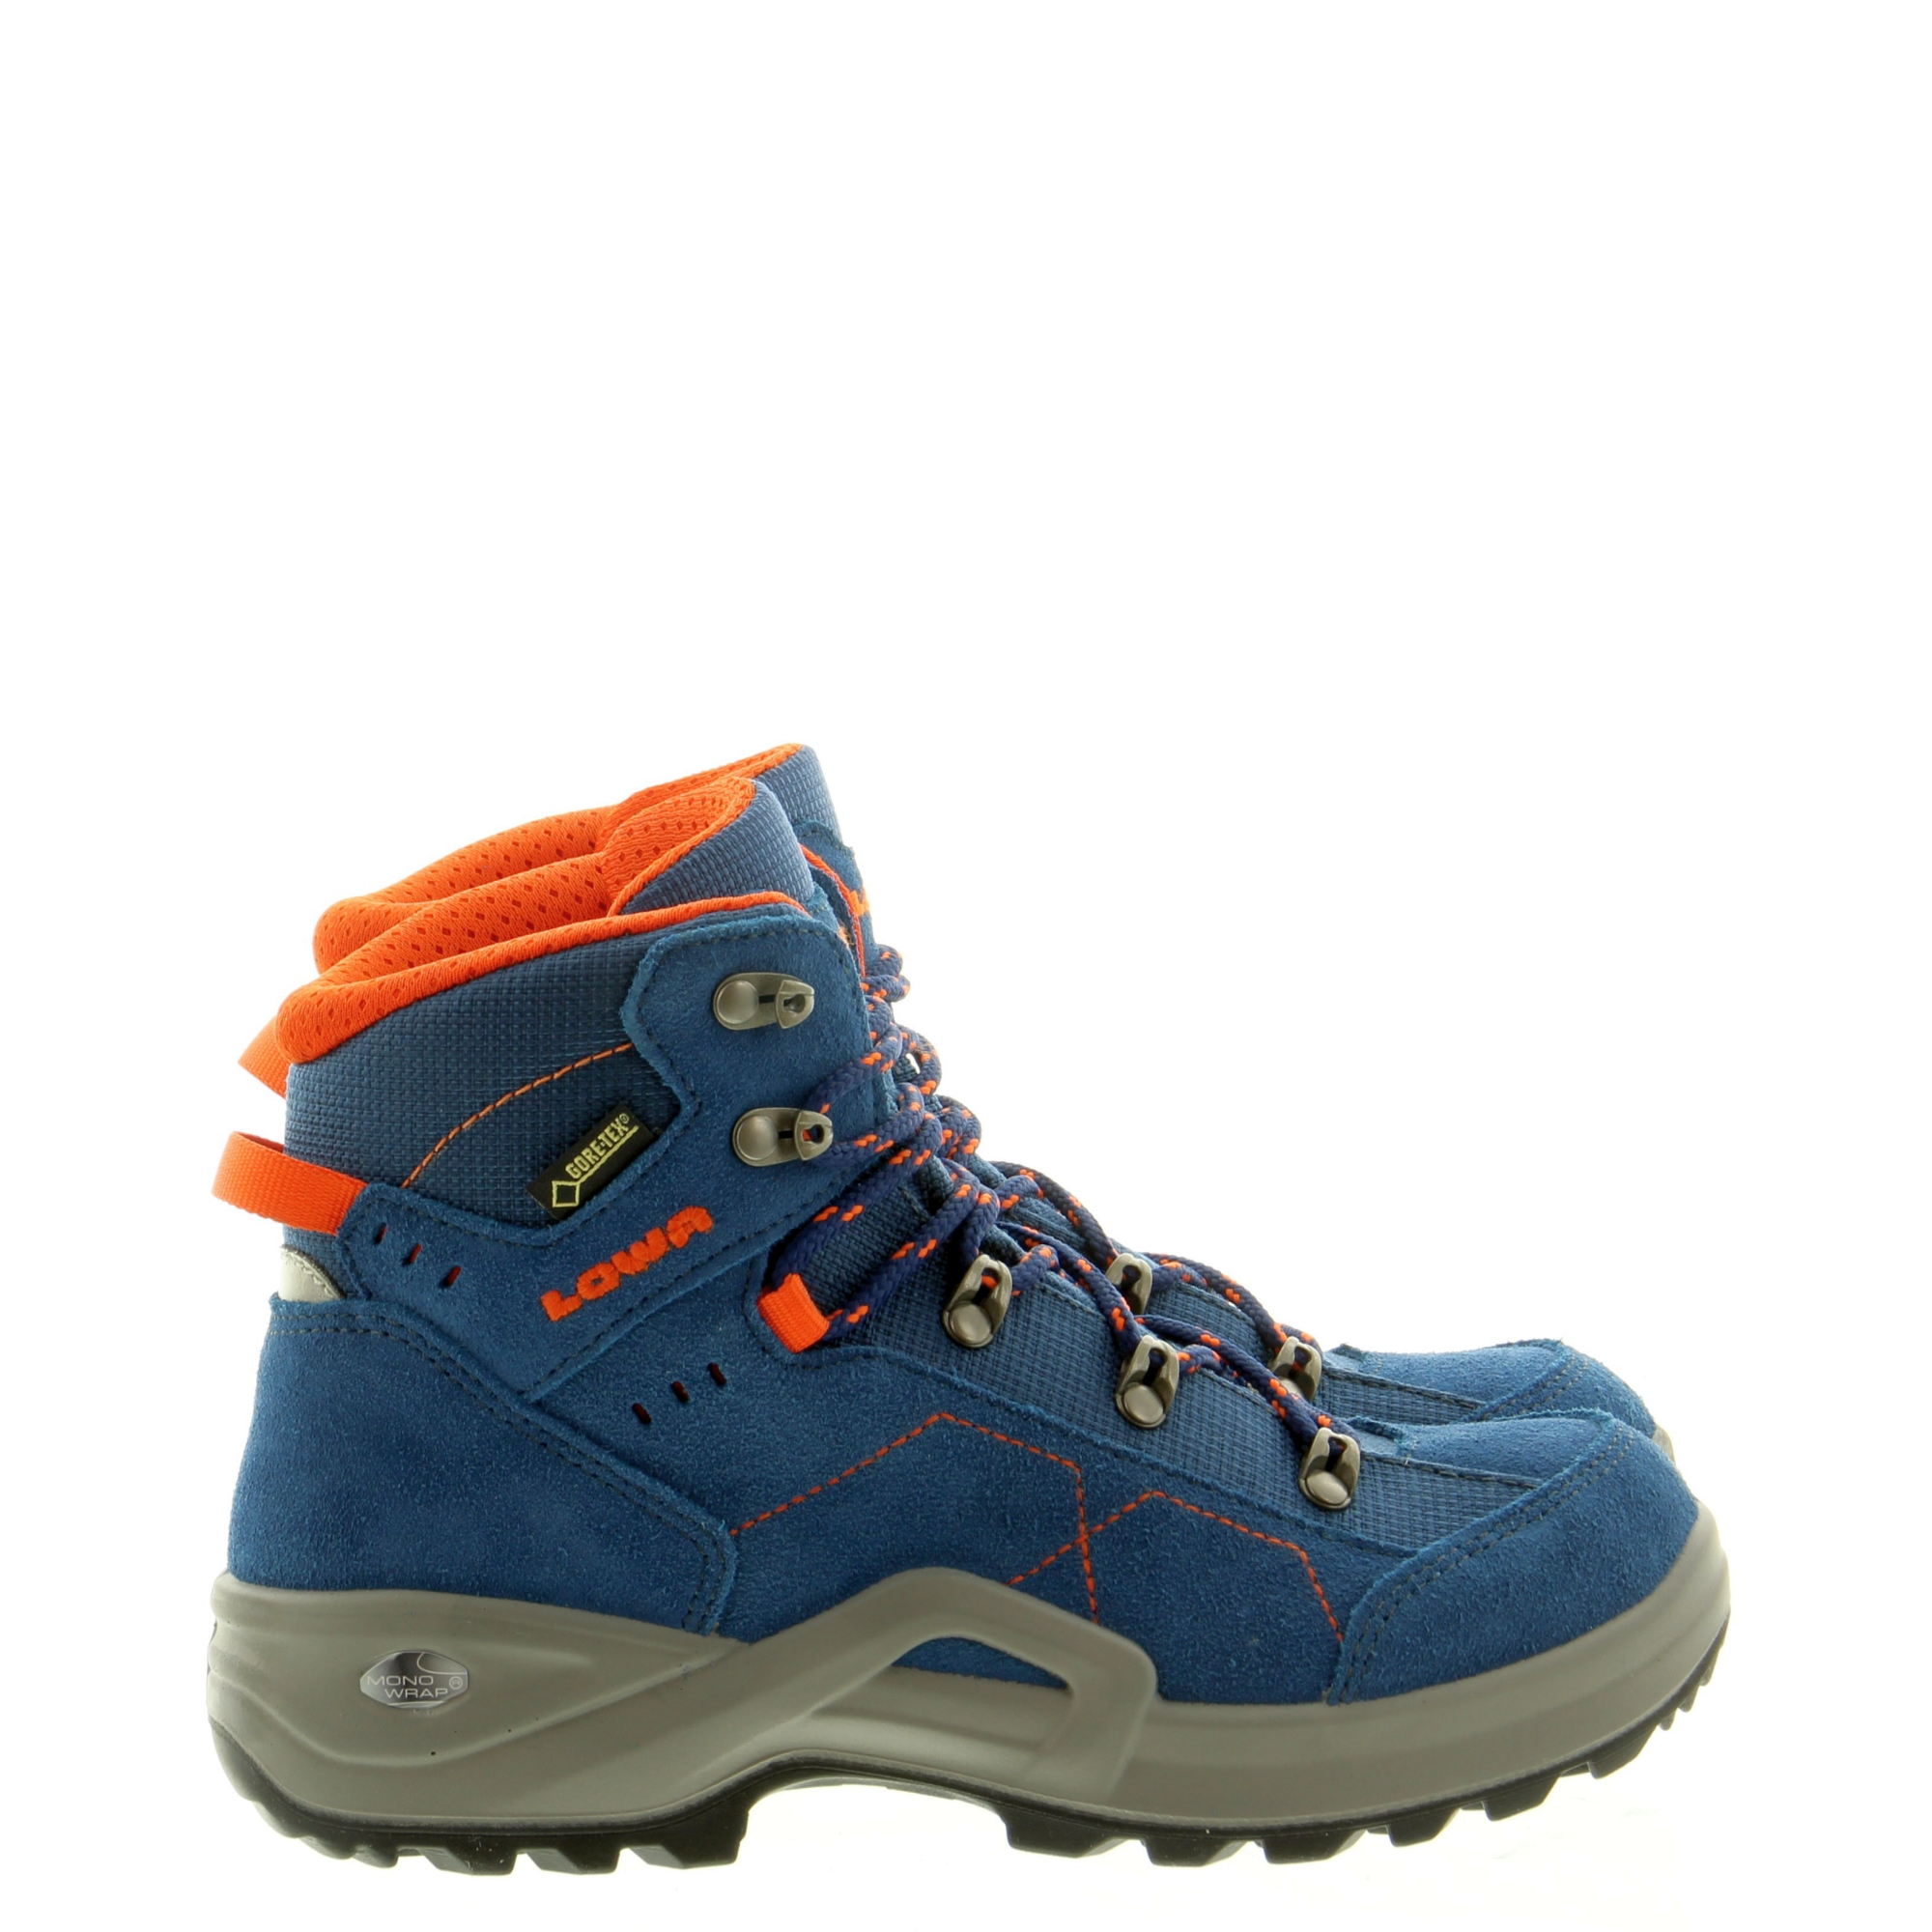 Lowa Kody III GTX Mid Jr 340-350099 6021 Blau Orange